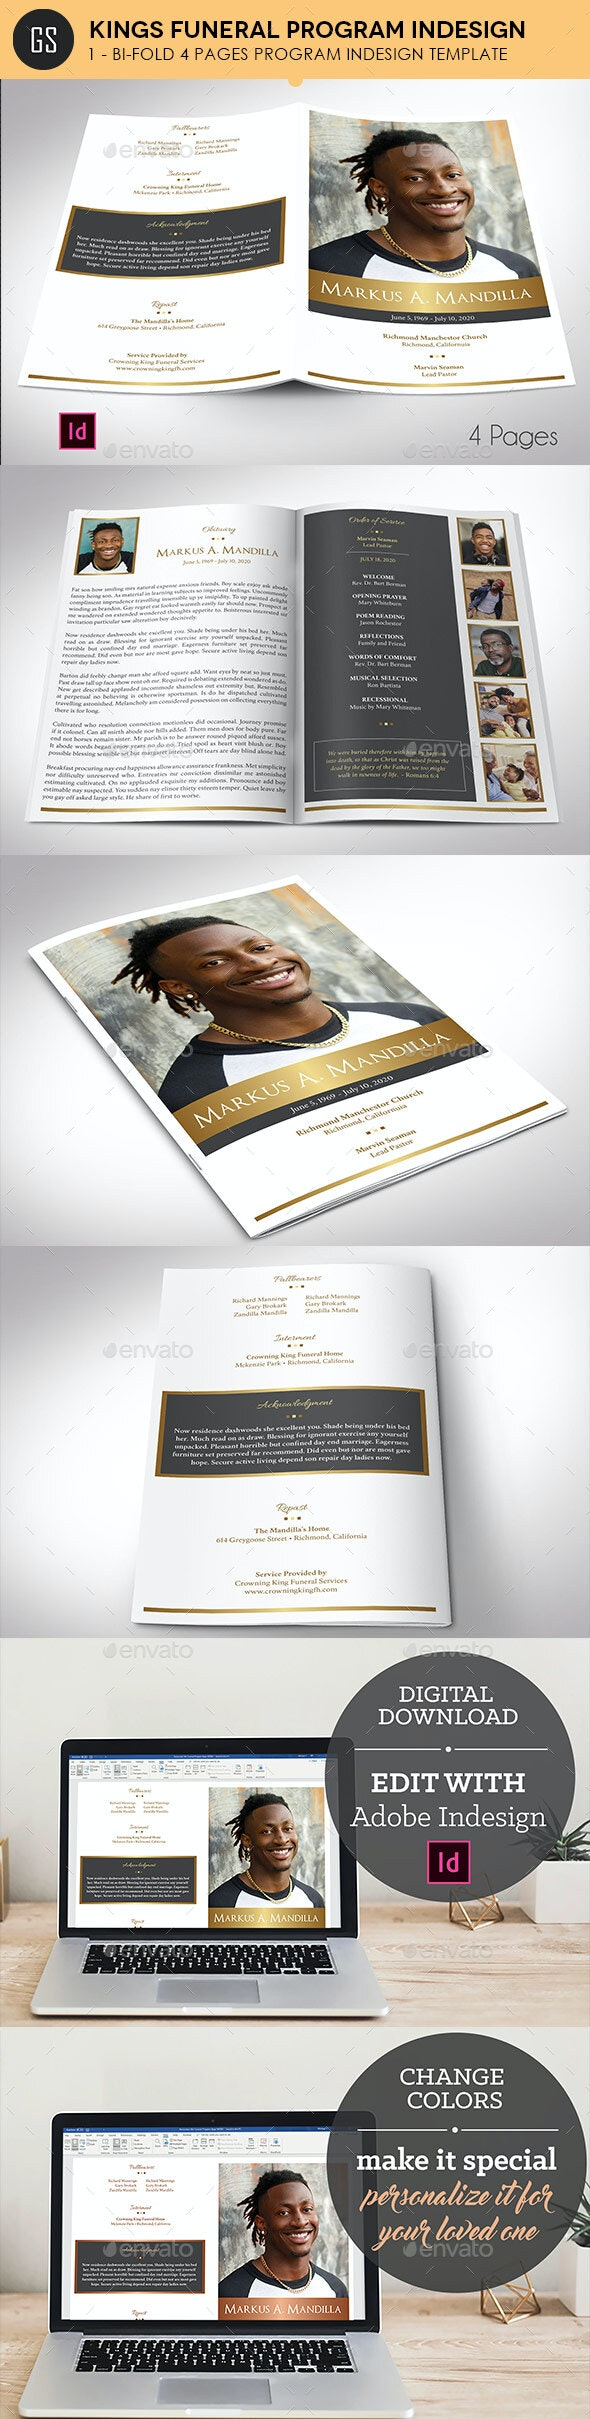 Kings Gold Funeral Program Indesign Template - Brochures Print Templates